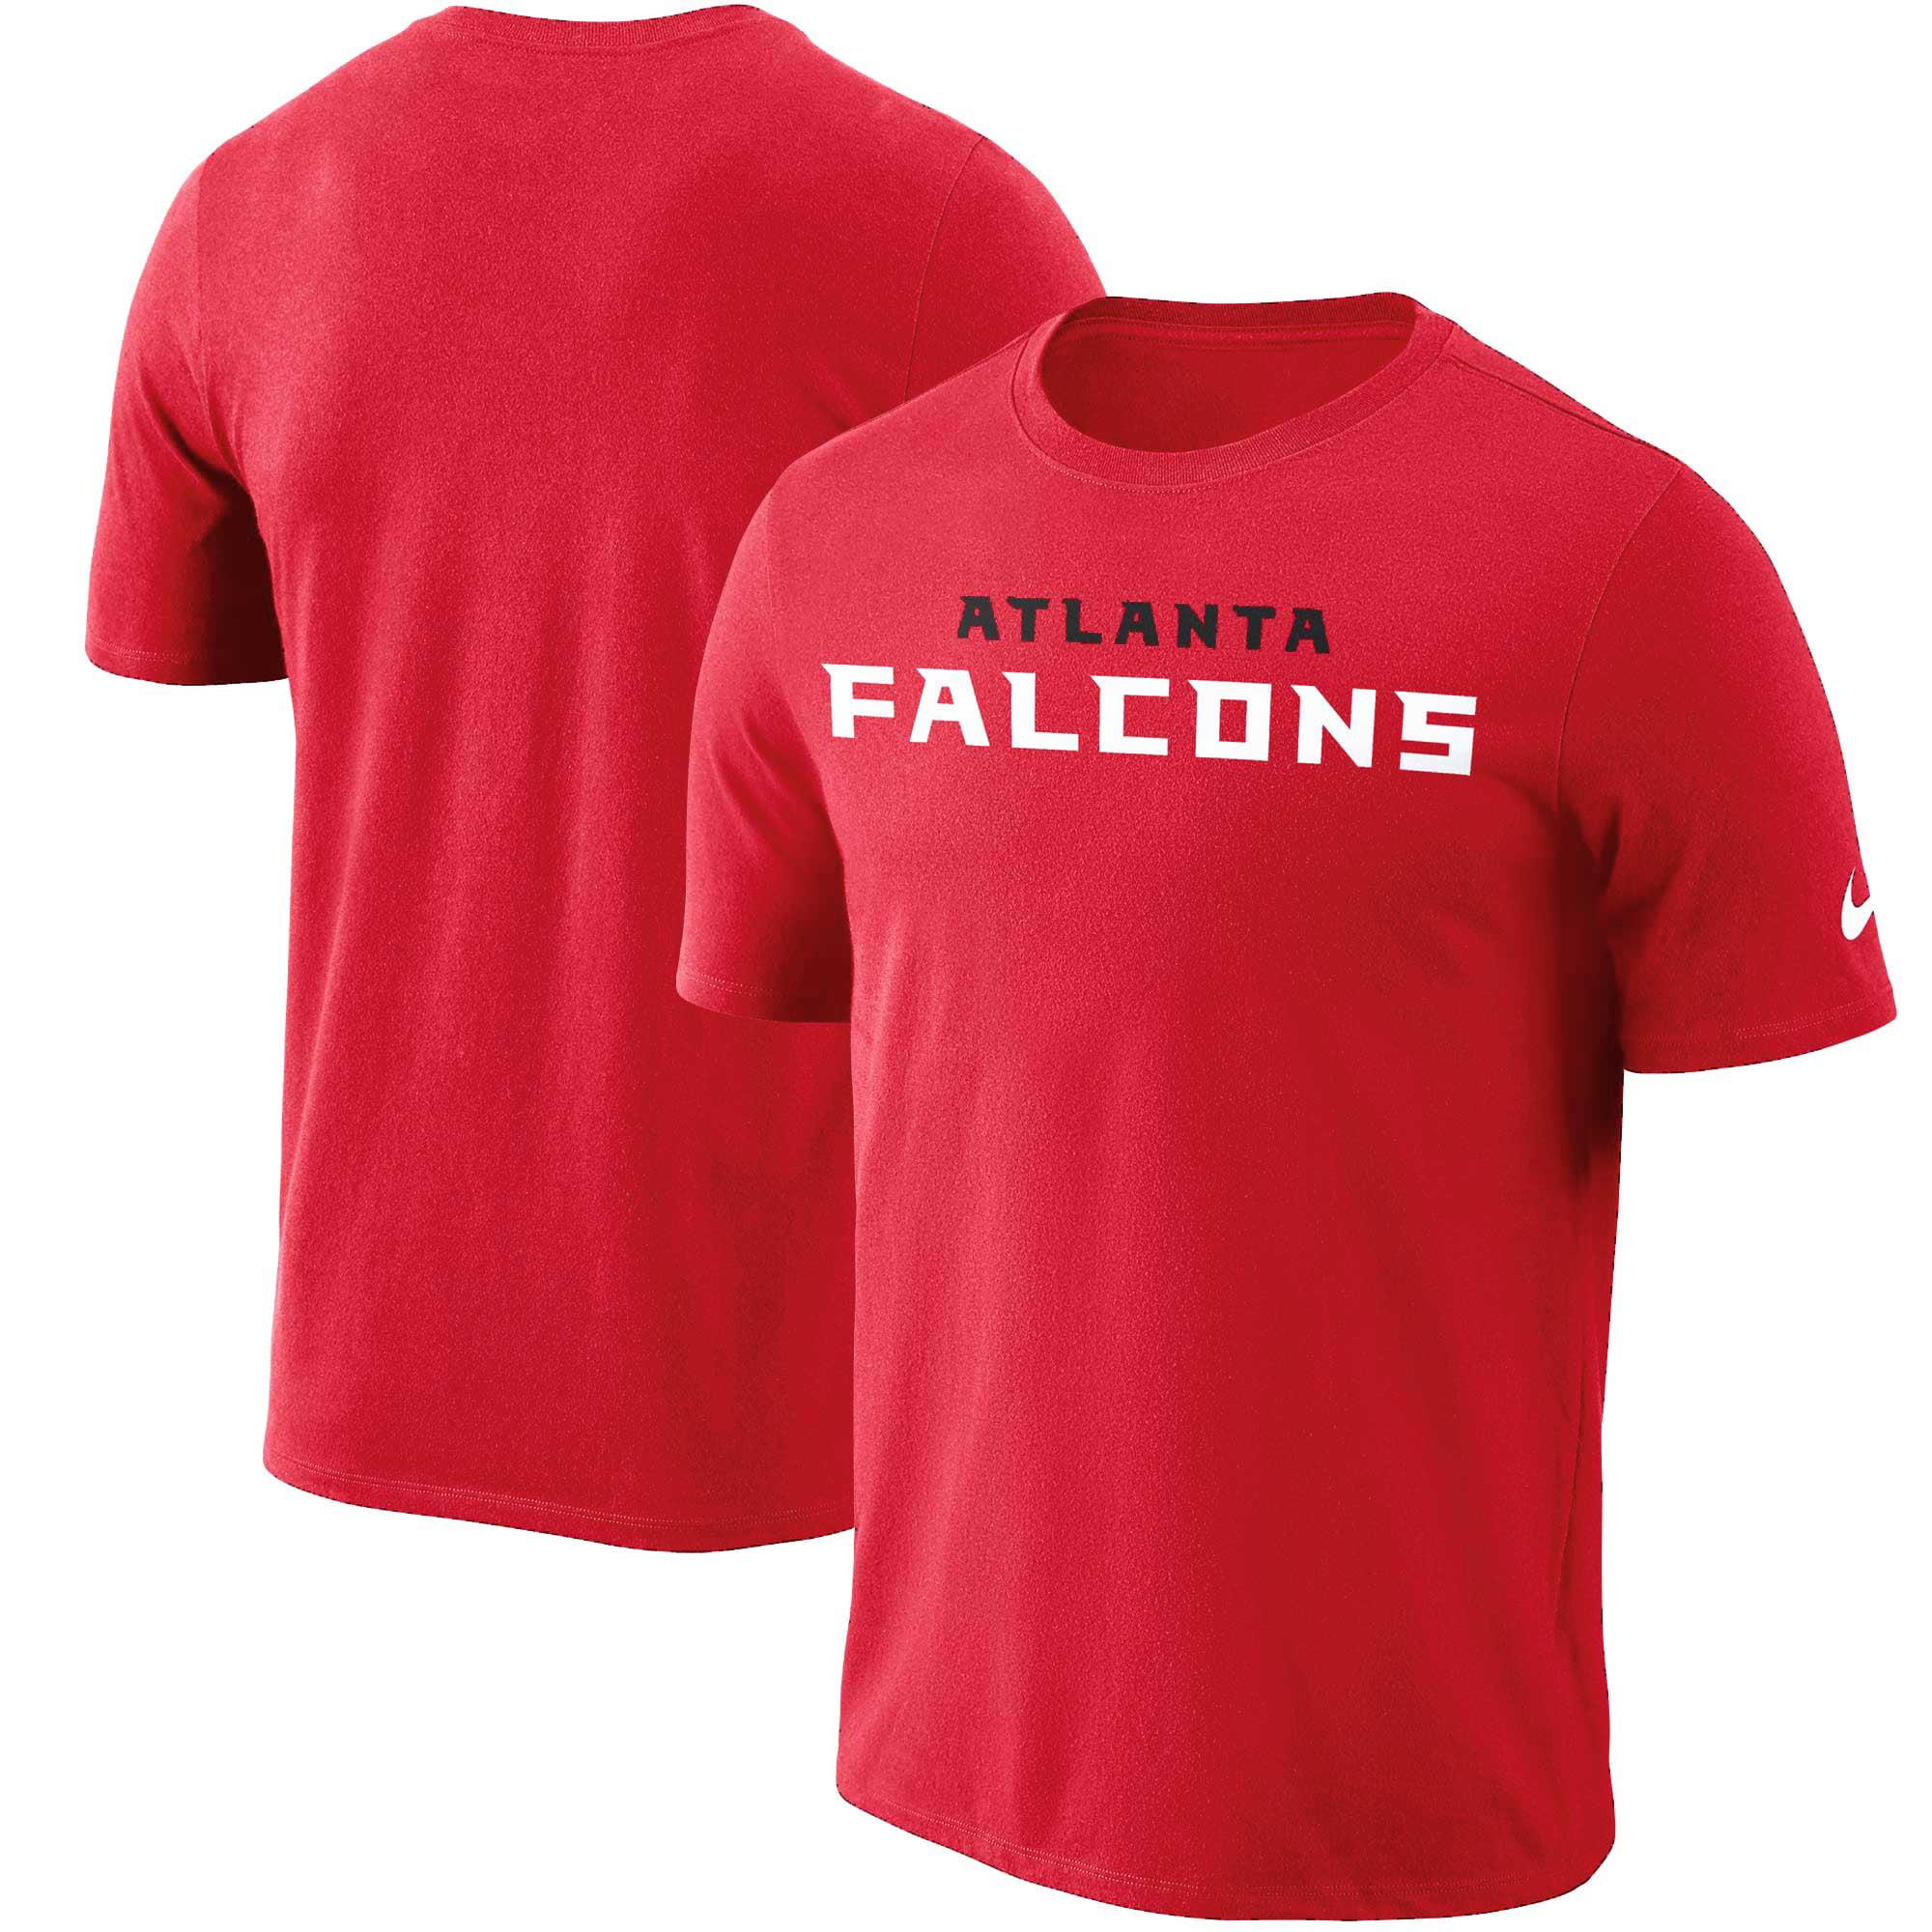 Atlanta Falcons Nike Dri-FIT Cotton Essential Wordmark T-Shirt - Red